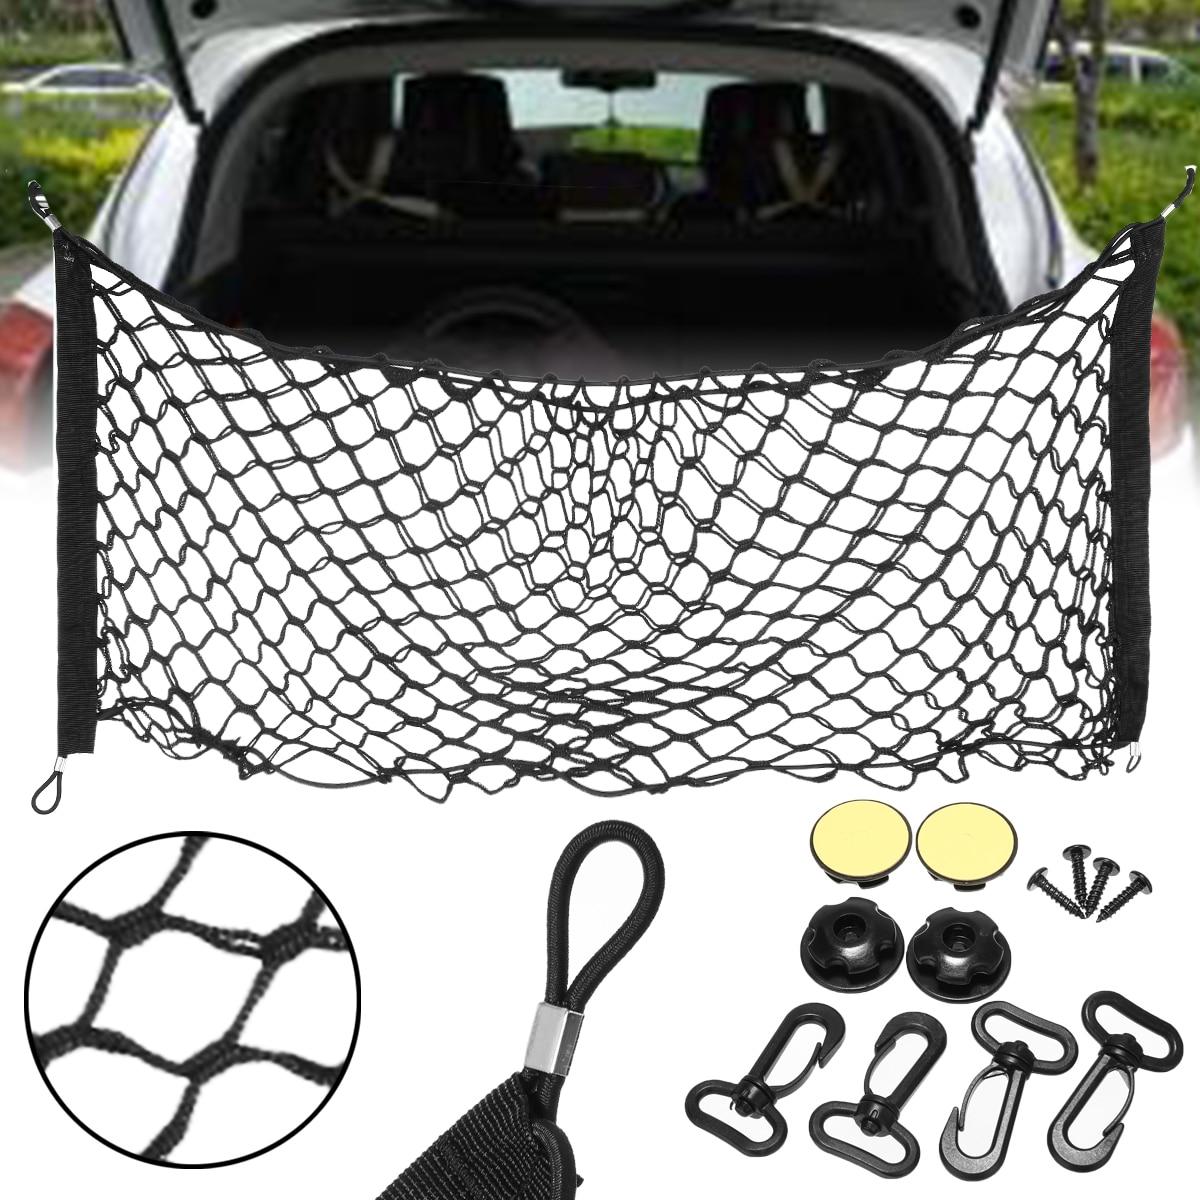 90cm*40cm Car Trunk Nets Elastic Strong Nylon Cargo Luggage Storage Organizer Net Mesh with Hooks For Car Van Pickup SUV MPV